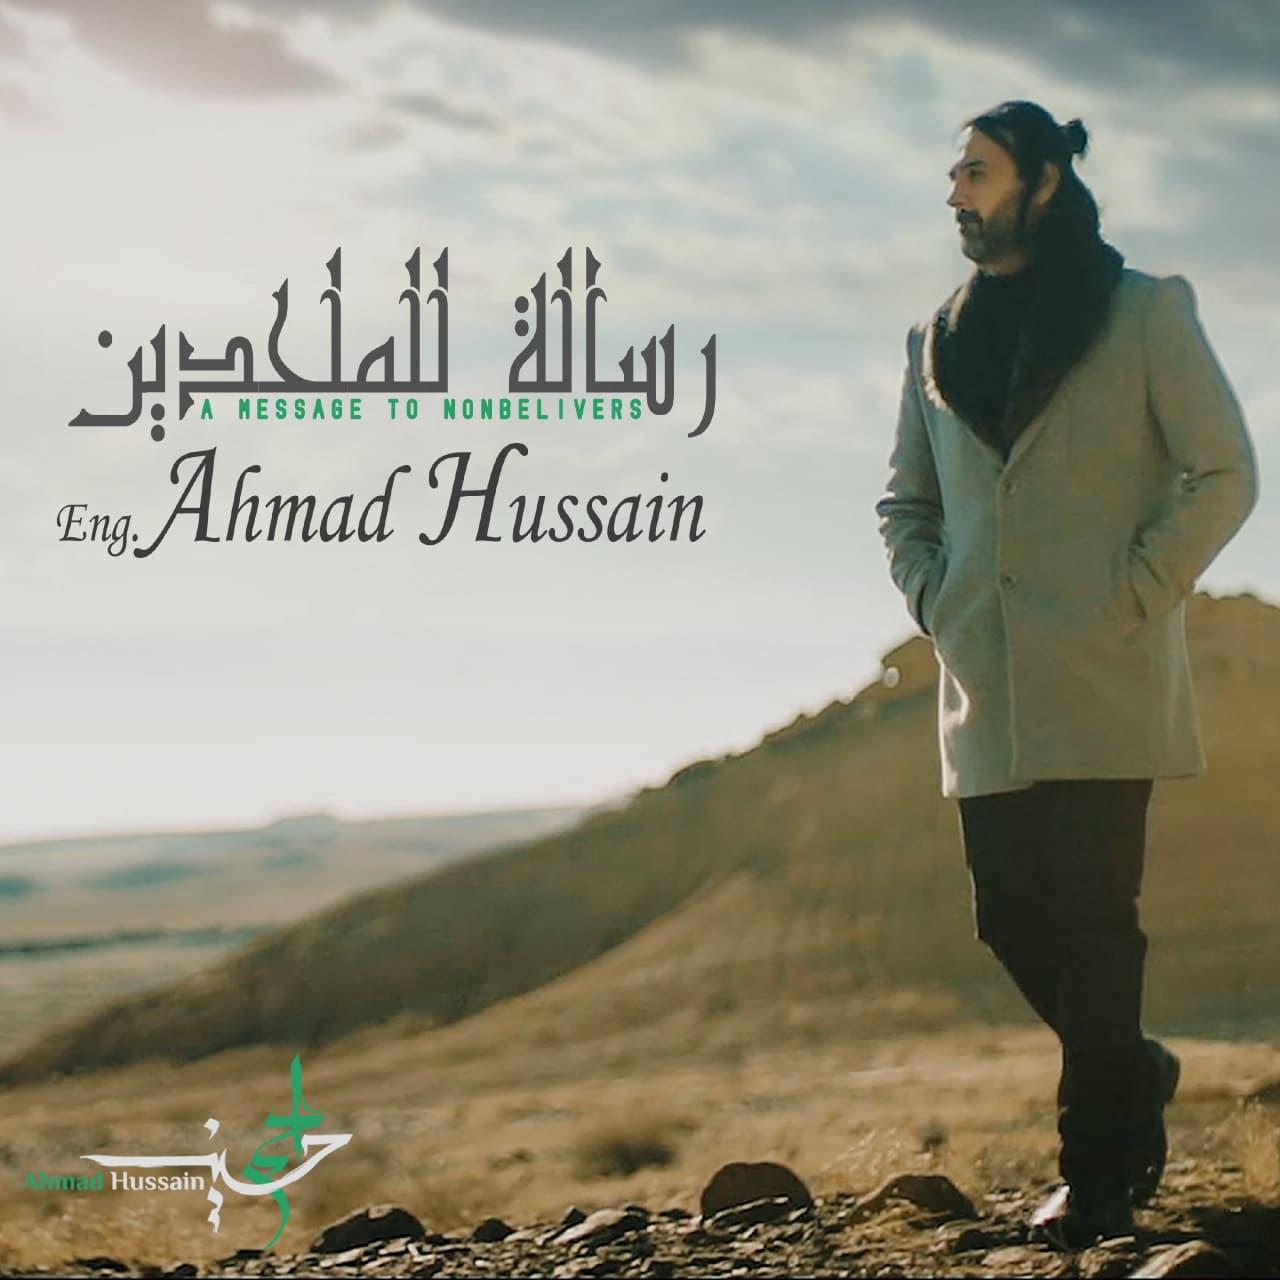 دانلود آهنگ احمد حسين رسالة للملحدين